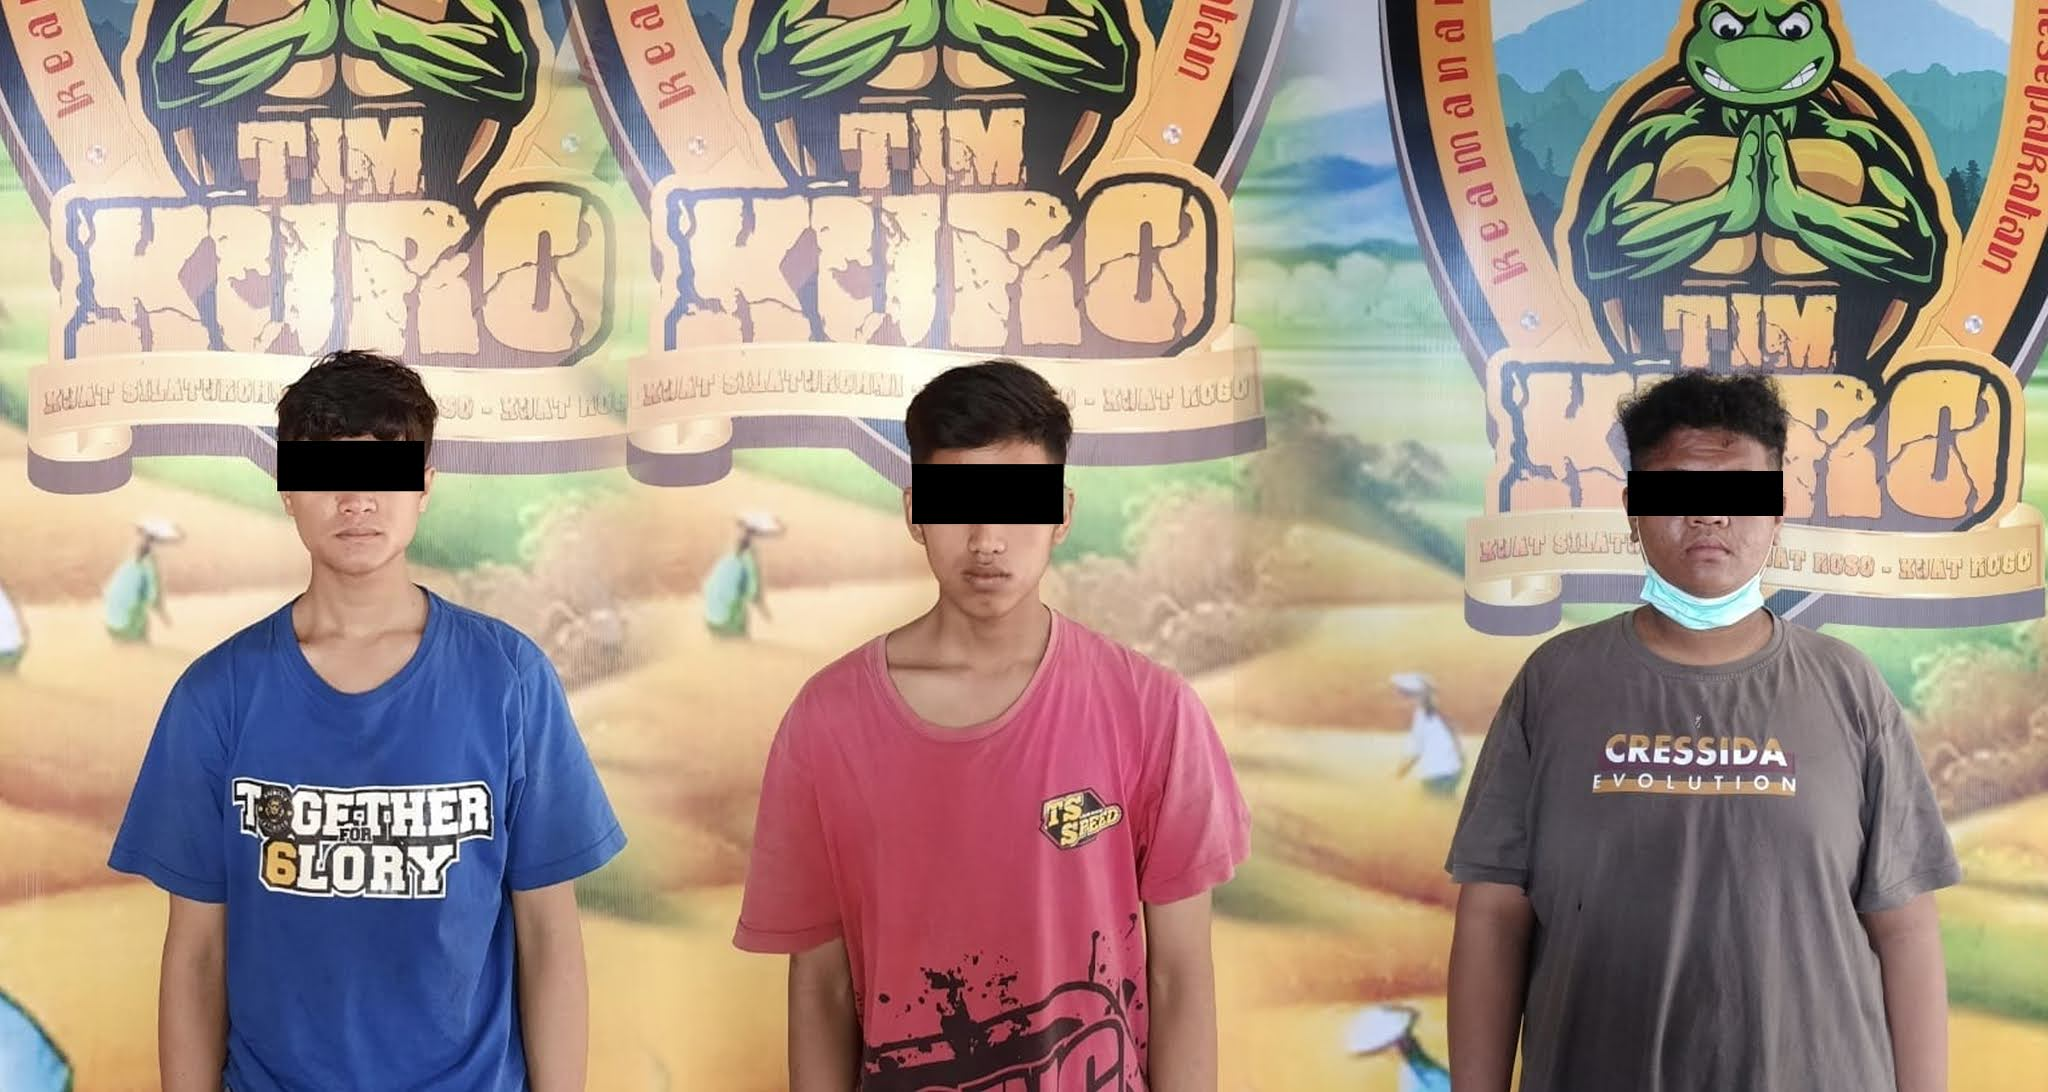 Diduga Mau Pesta Sabu, 3 Remaja Ditangkap